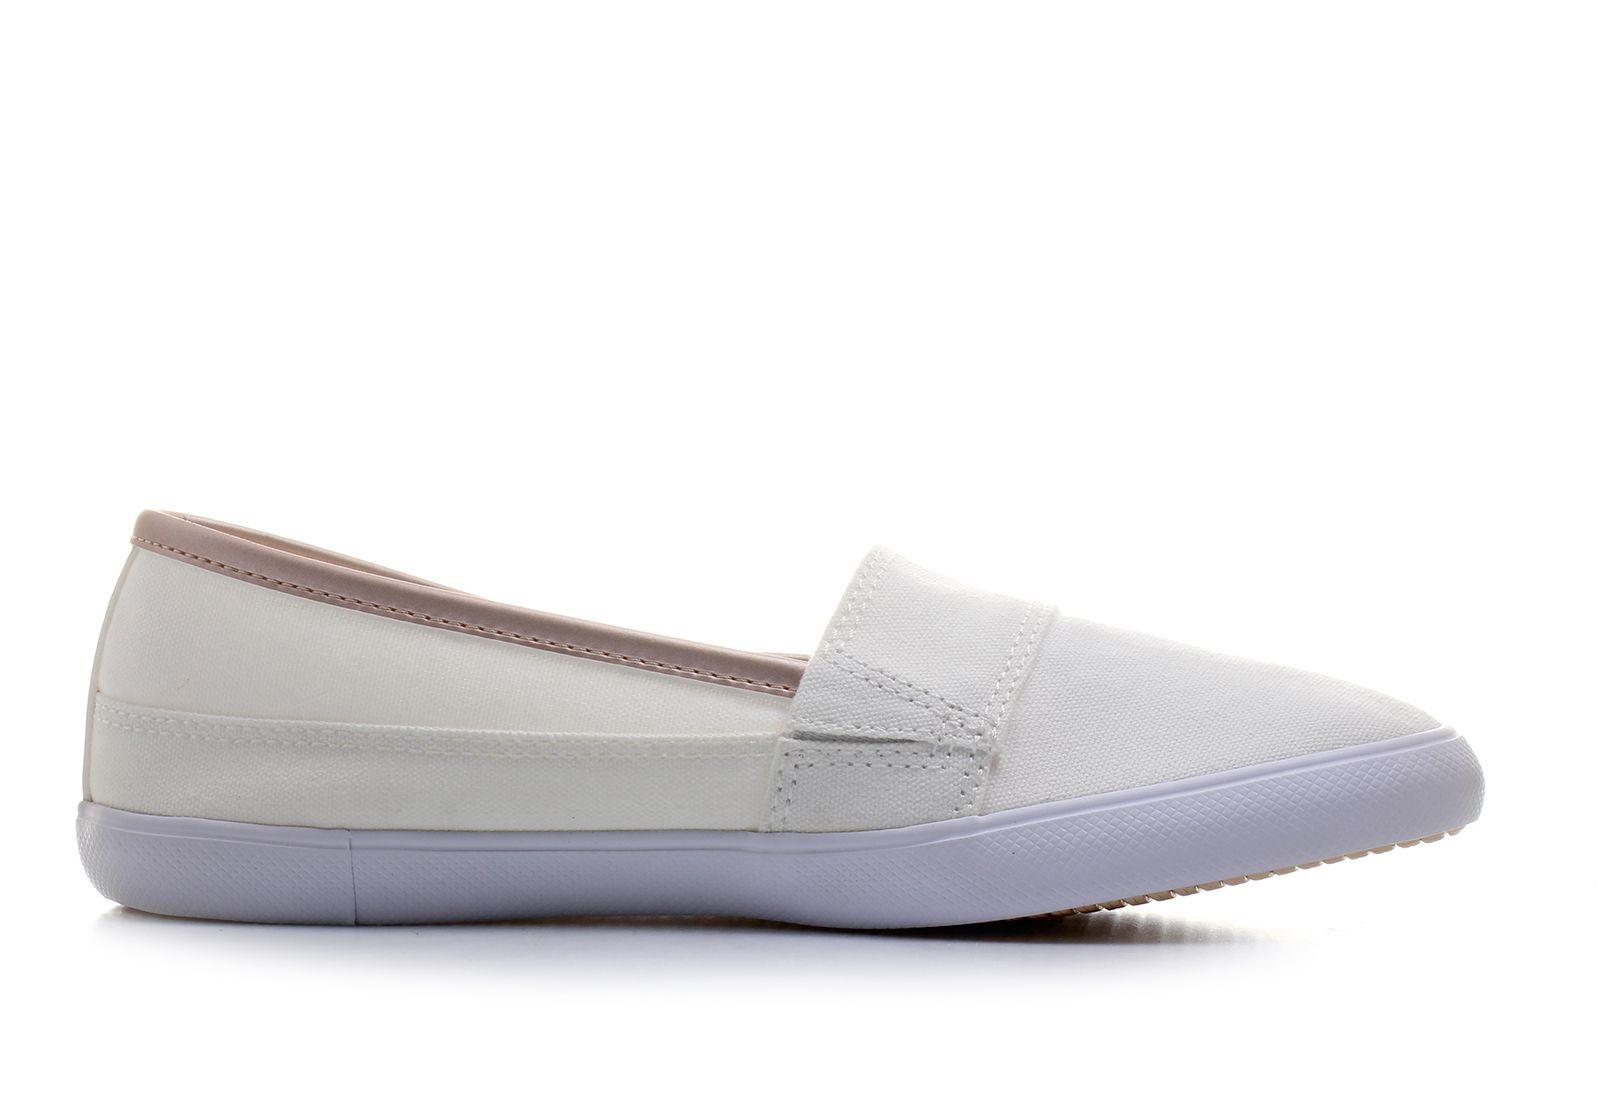 Lacoste Slip-On - marice - 172caw1080-001 - Office Shoes Magyarország cead420af4